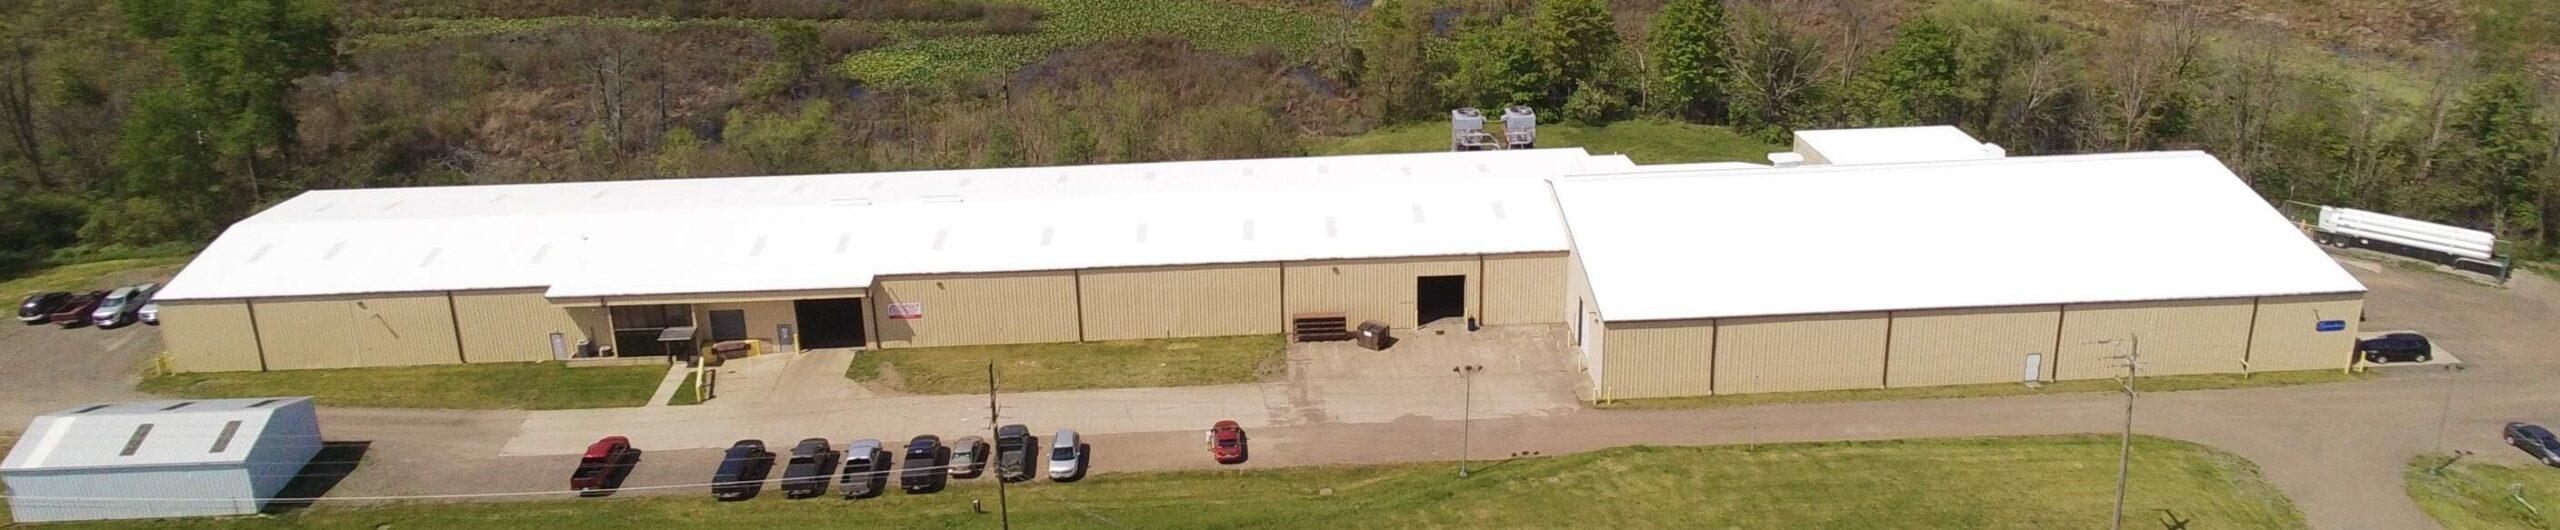 Harmonsburg, PA, elastomeric coating